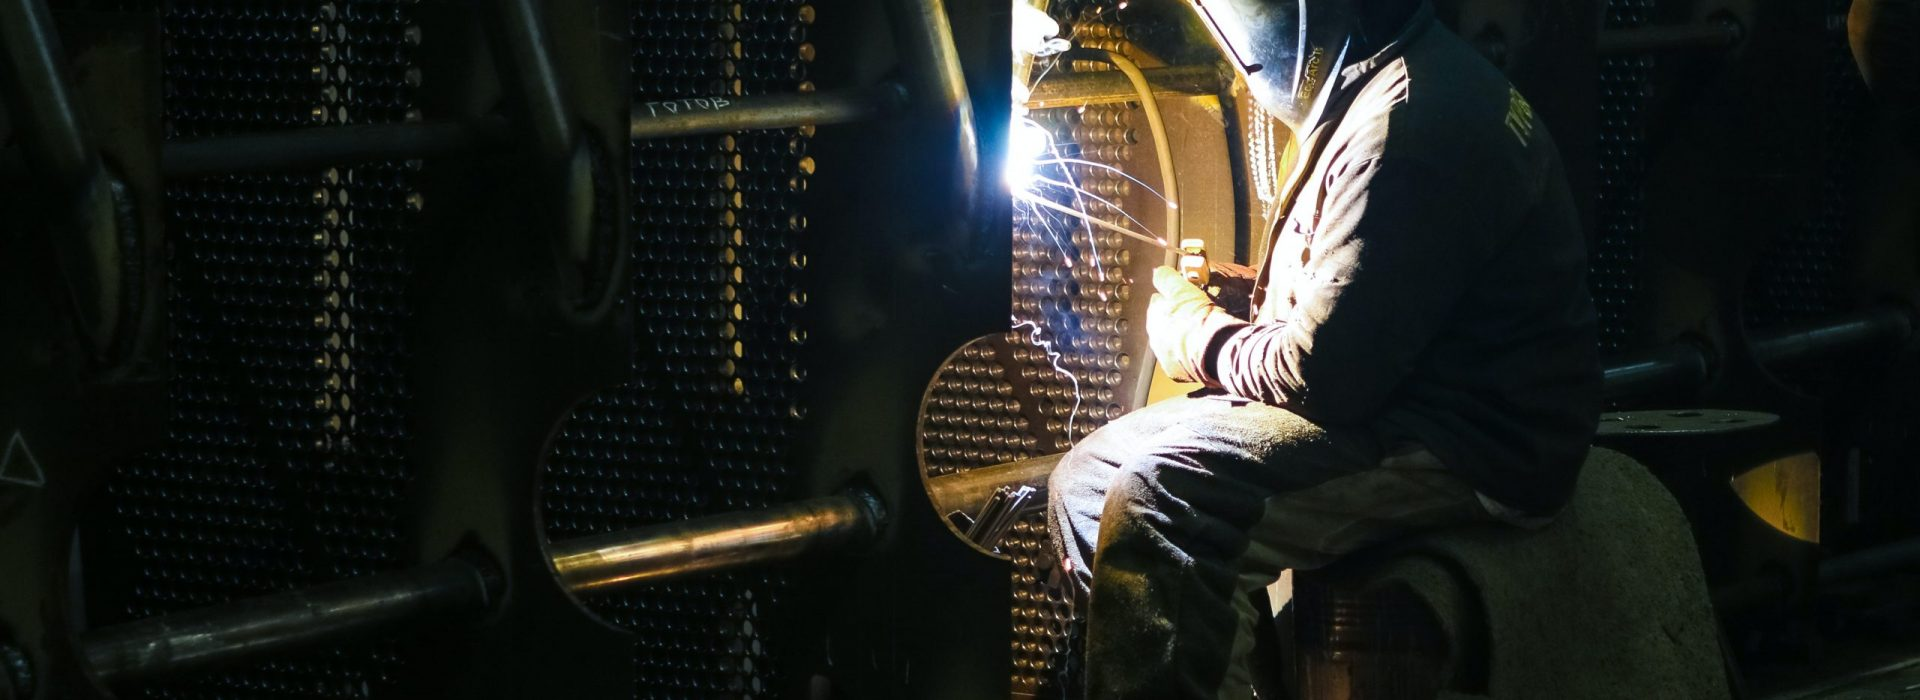 man-doing-welding-work-3181187